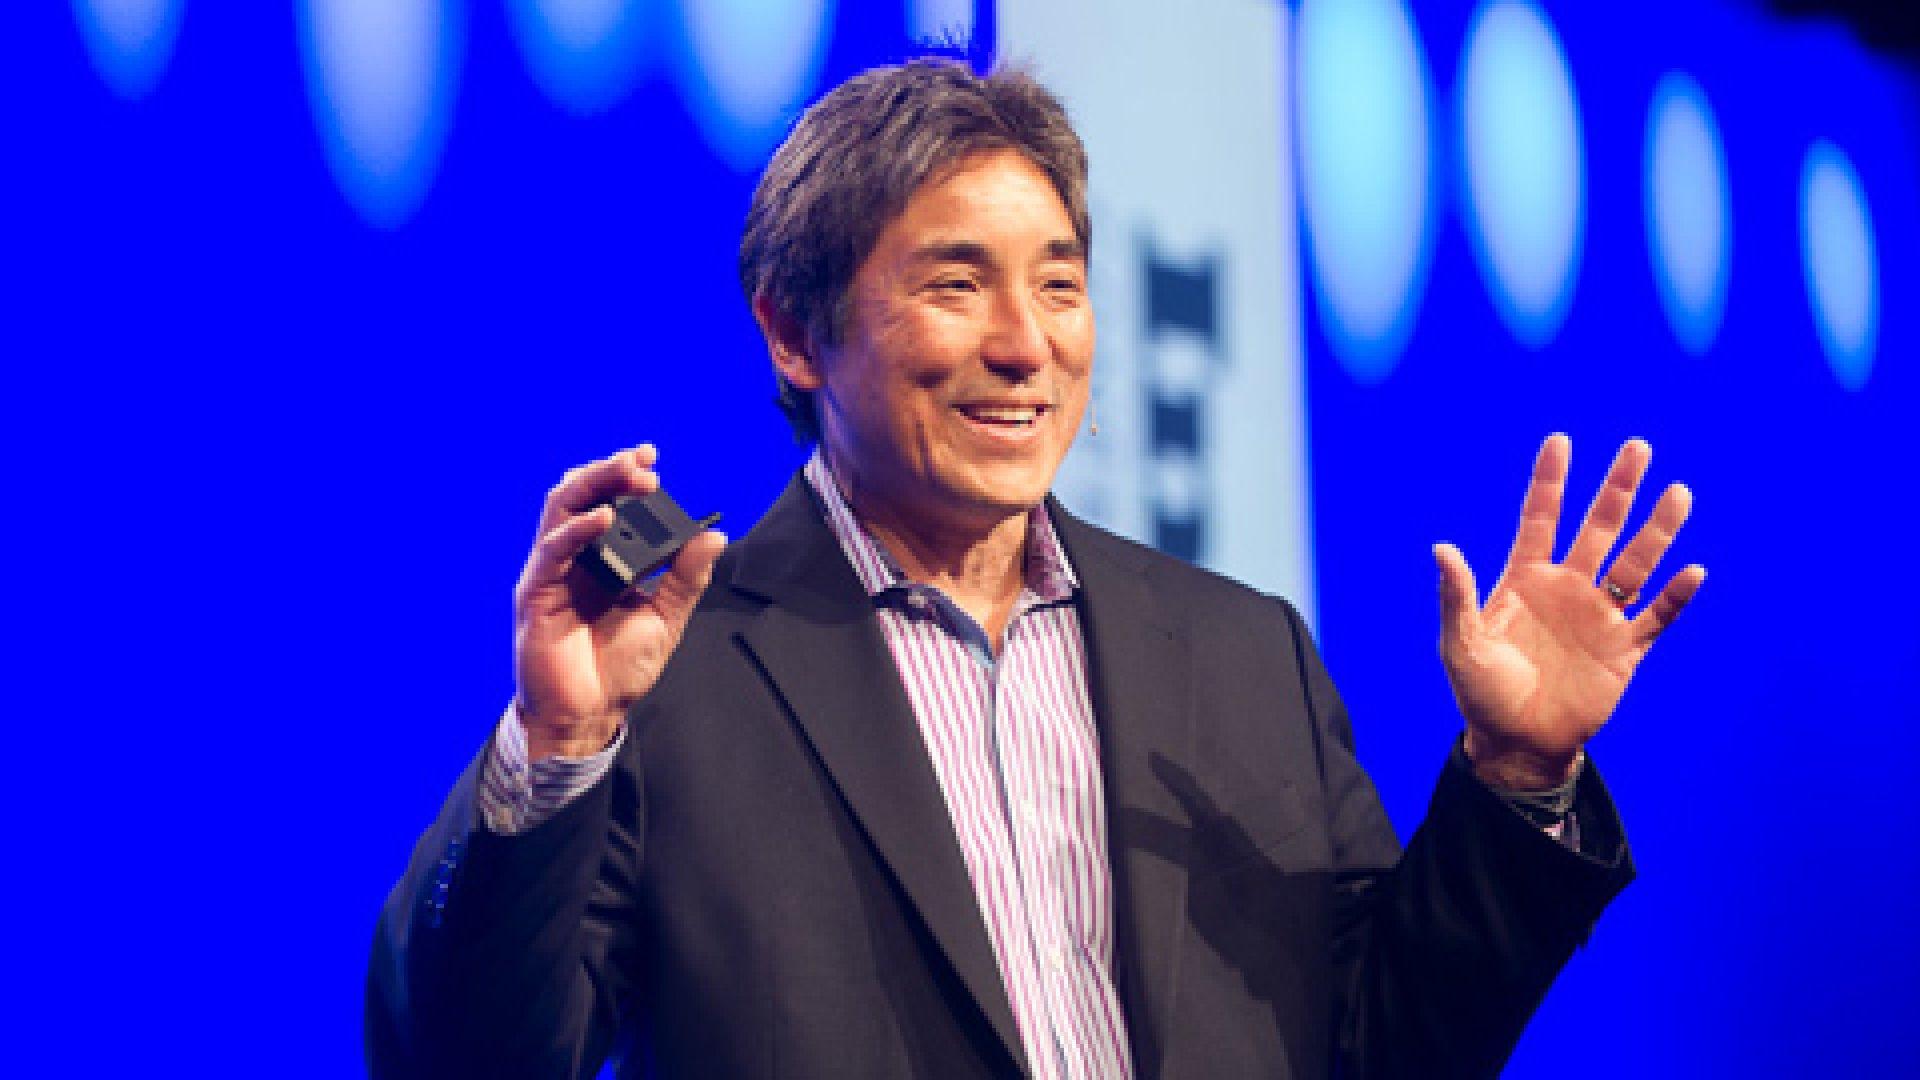 Guy Kawasaki: Enchant Customers Like Apple, Zappos & Virgin